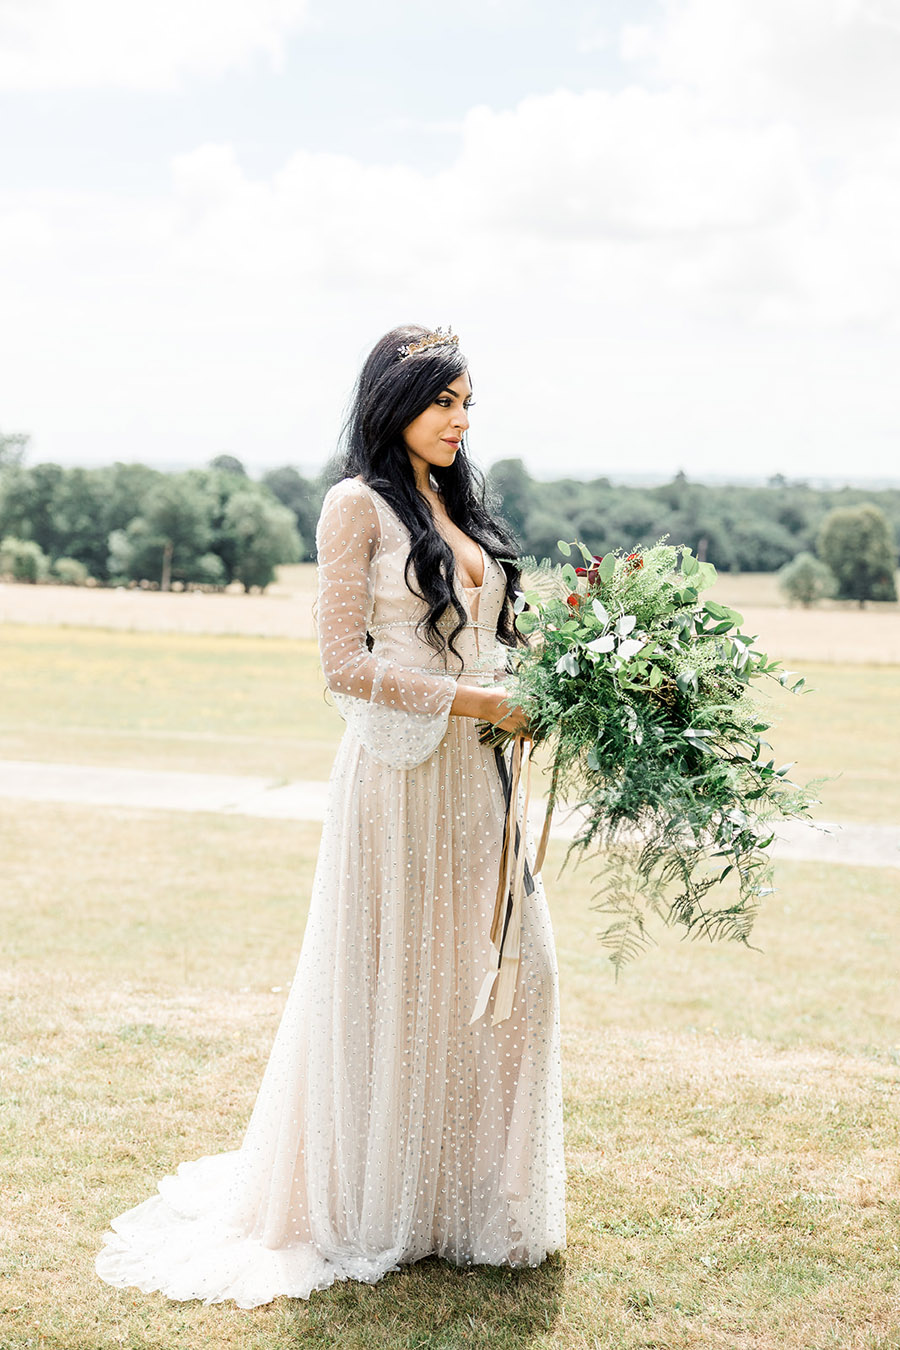 Modern Boho wedding style inspiration from Slindon House, photographer credit Kelsie Scully Photography (17)